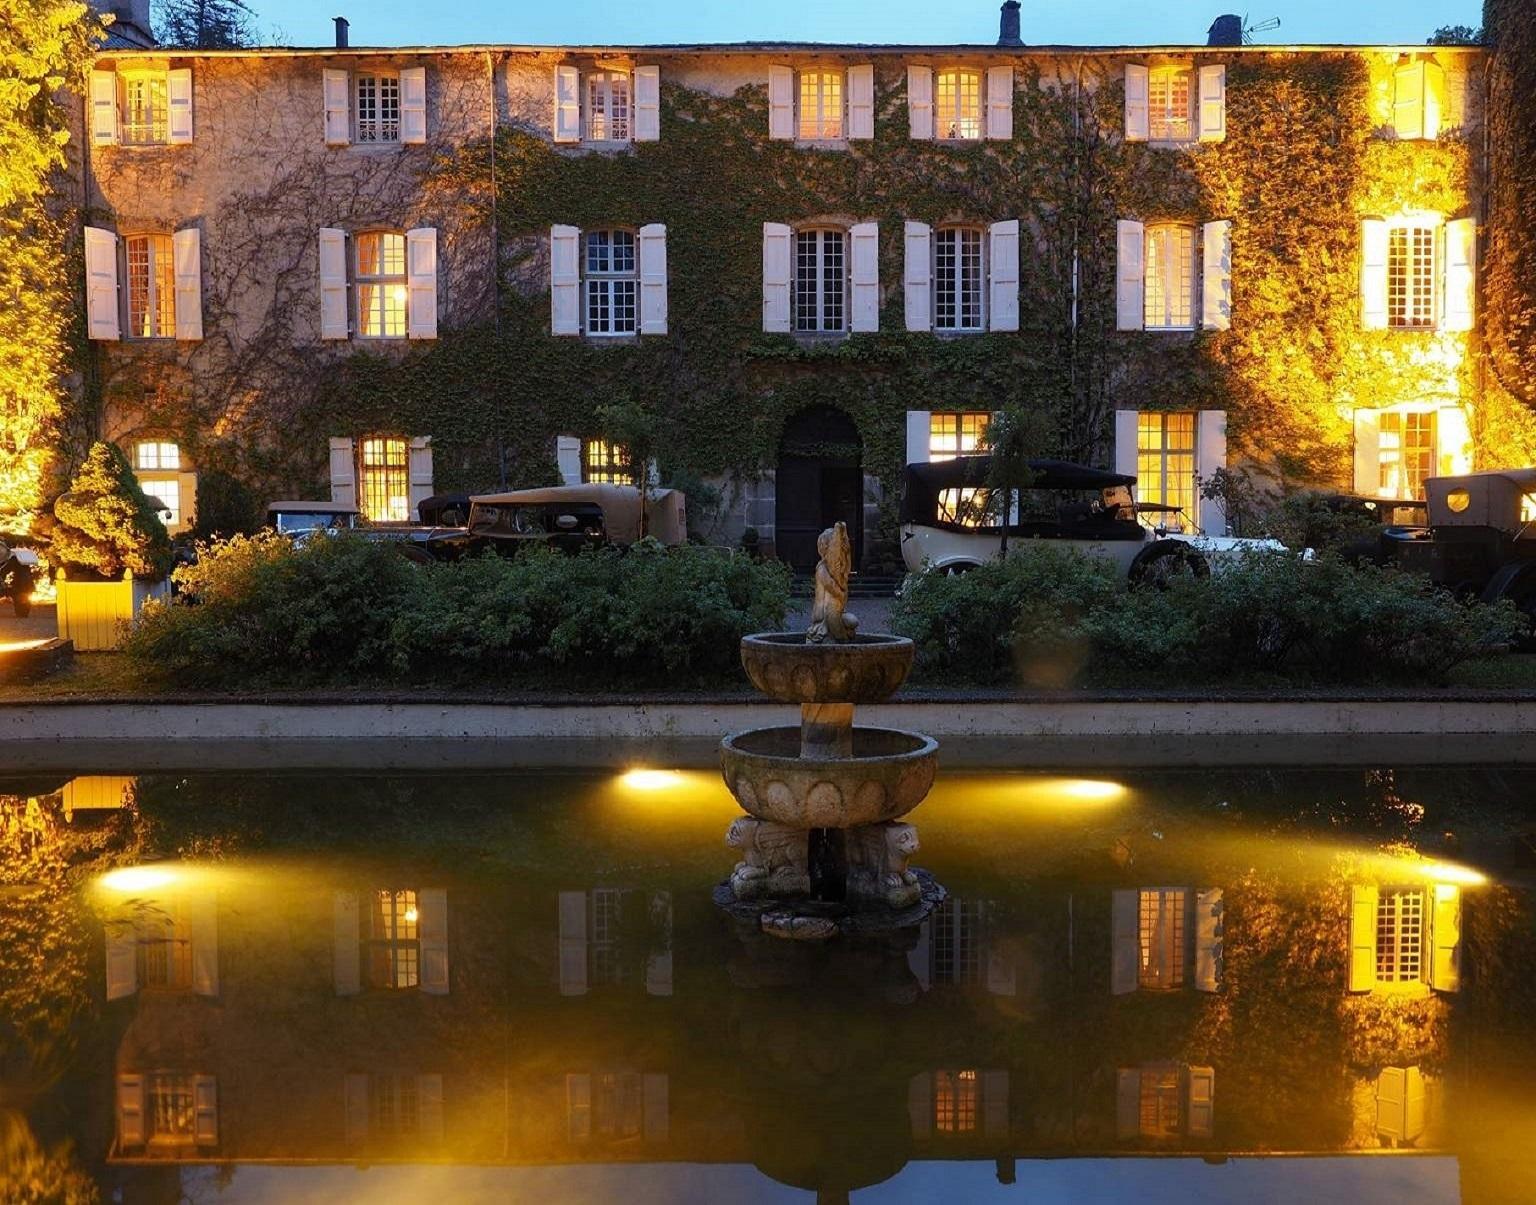 chateau-des-ayres-losere-ocitanie-night